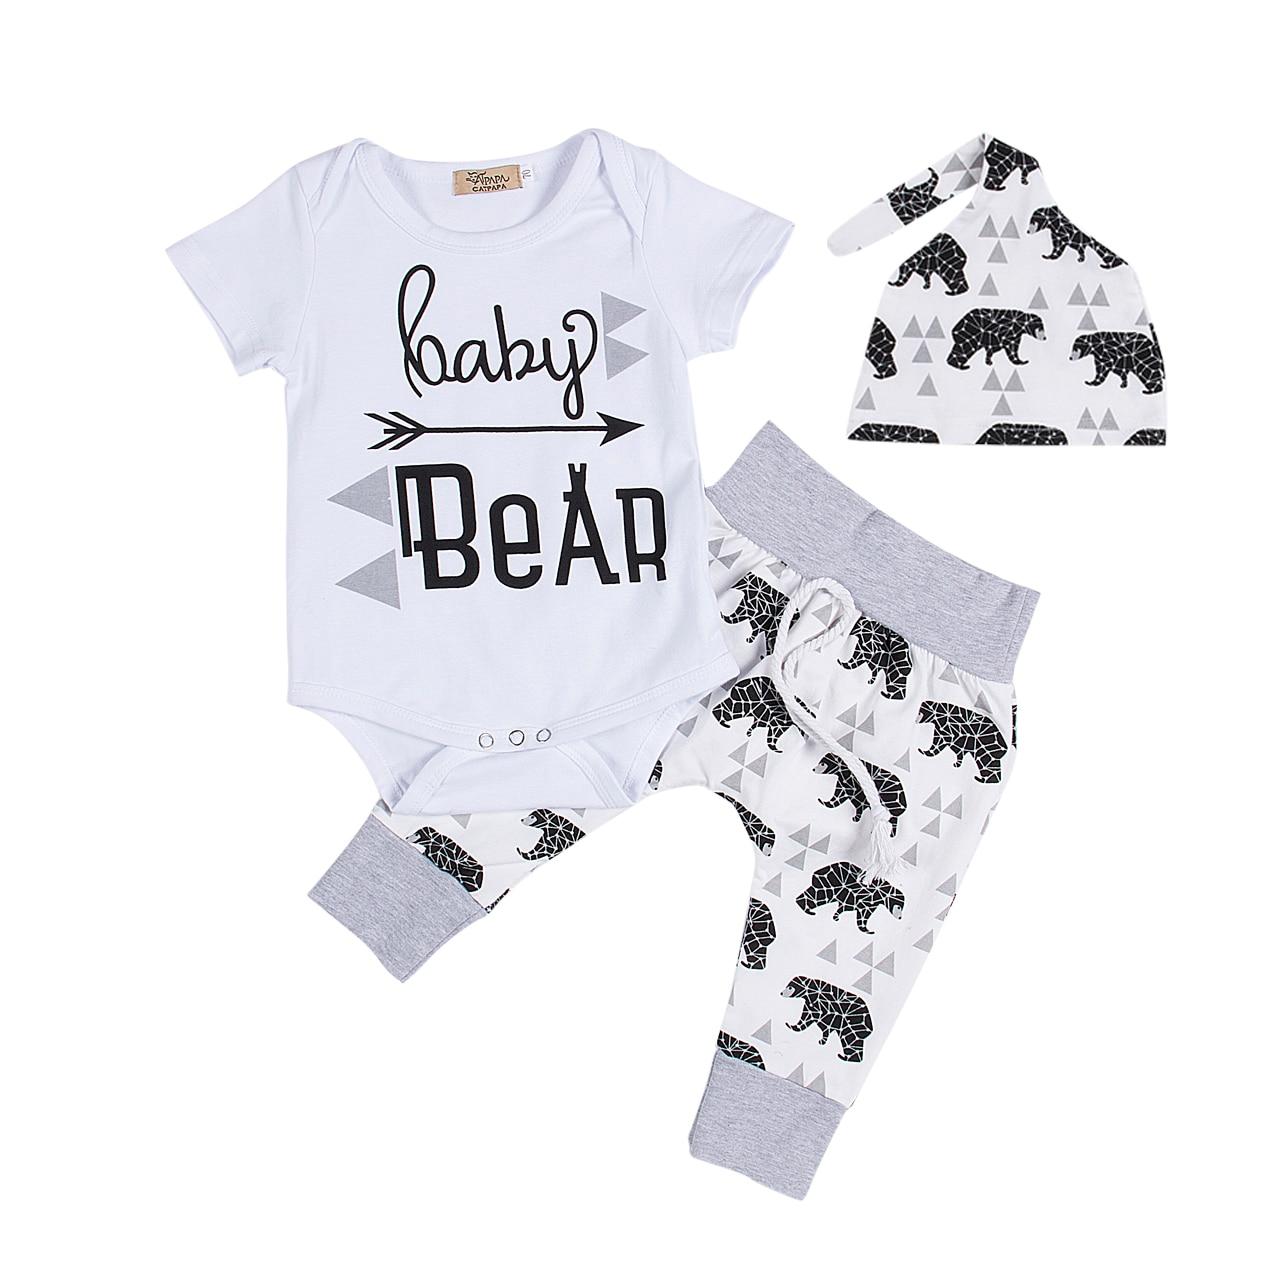 3PCS Set Newborn Infant Baby Clothes Short Sleeve Baby Bear Boys Girls Romper Pant Hat Outfit Bebek Giyim Clothing Costume<br><br>Aliexpress